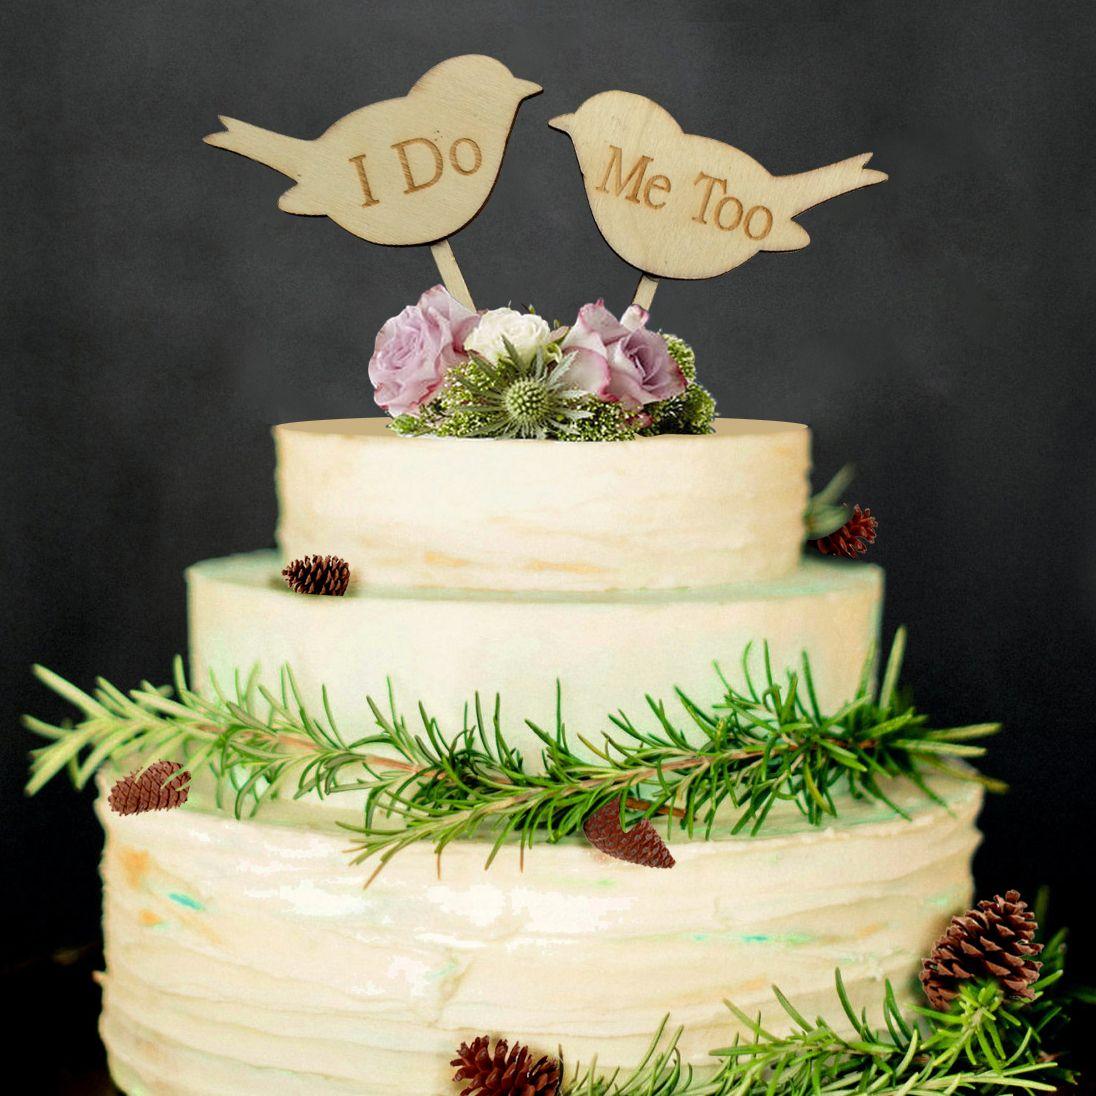 Grosshandel Grosshandel Holz Kuchen Topper Fur Wed Kuchen Dekoration